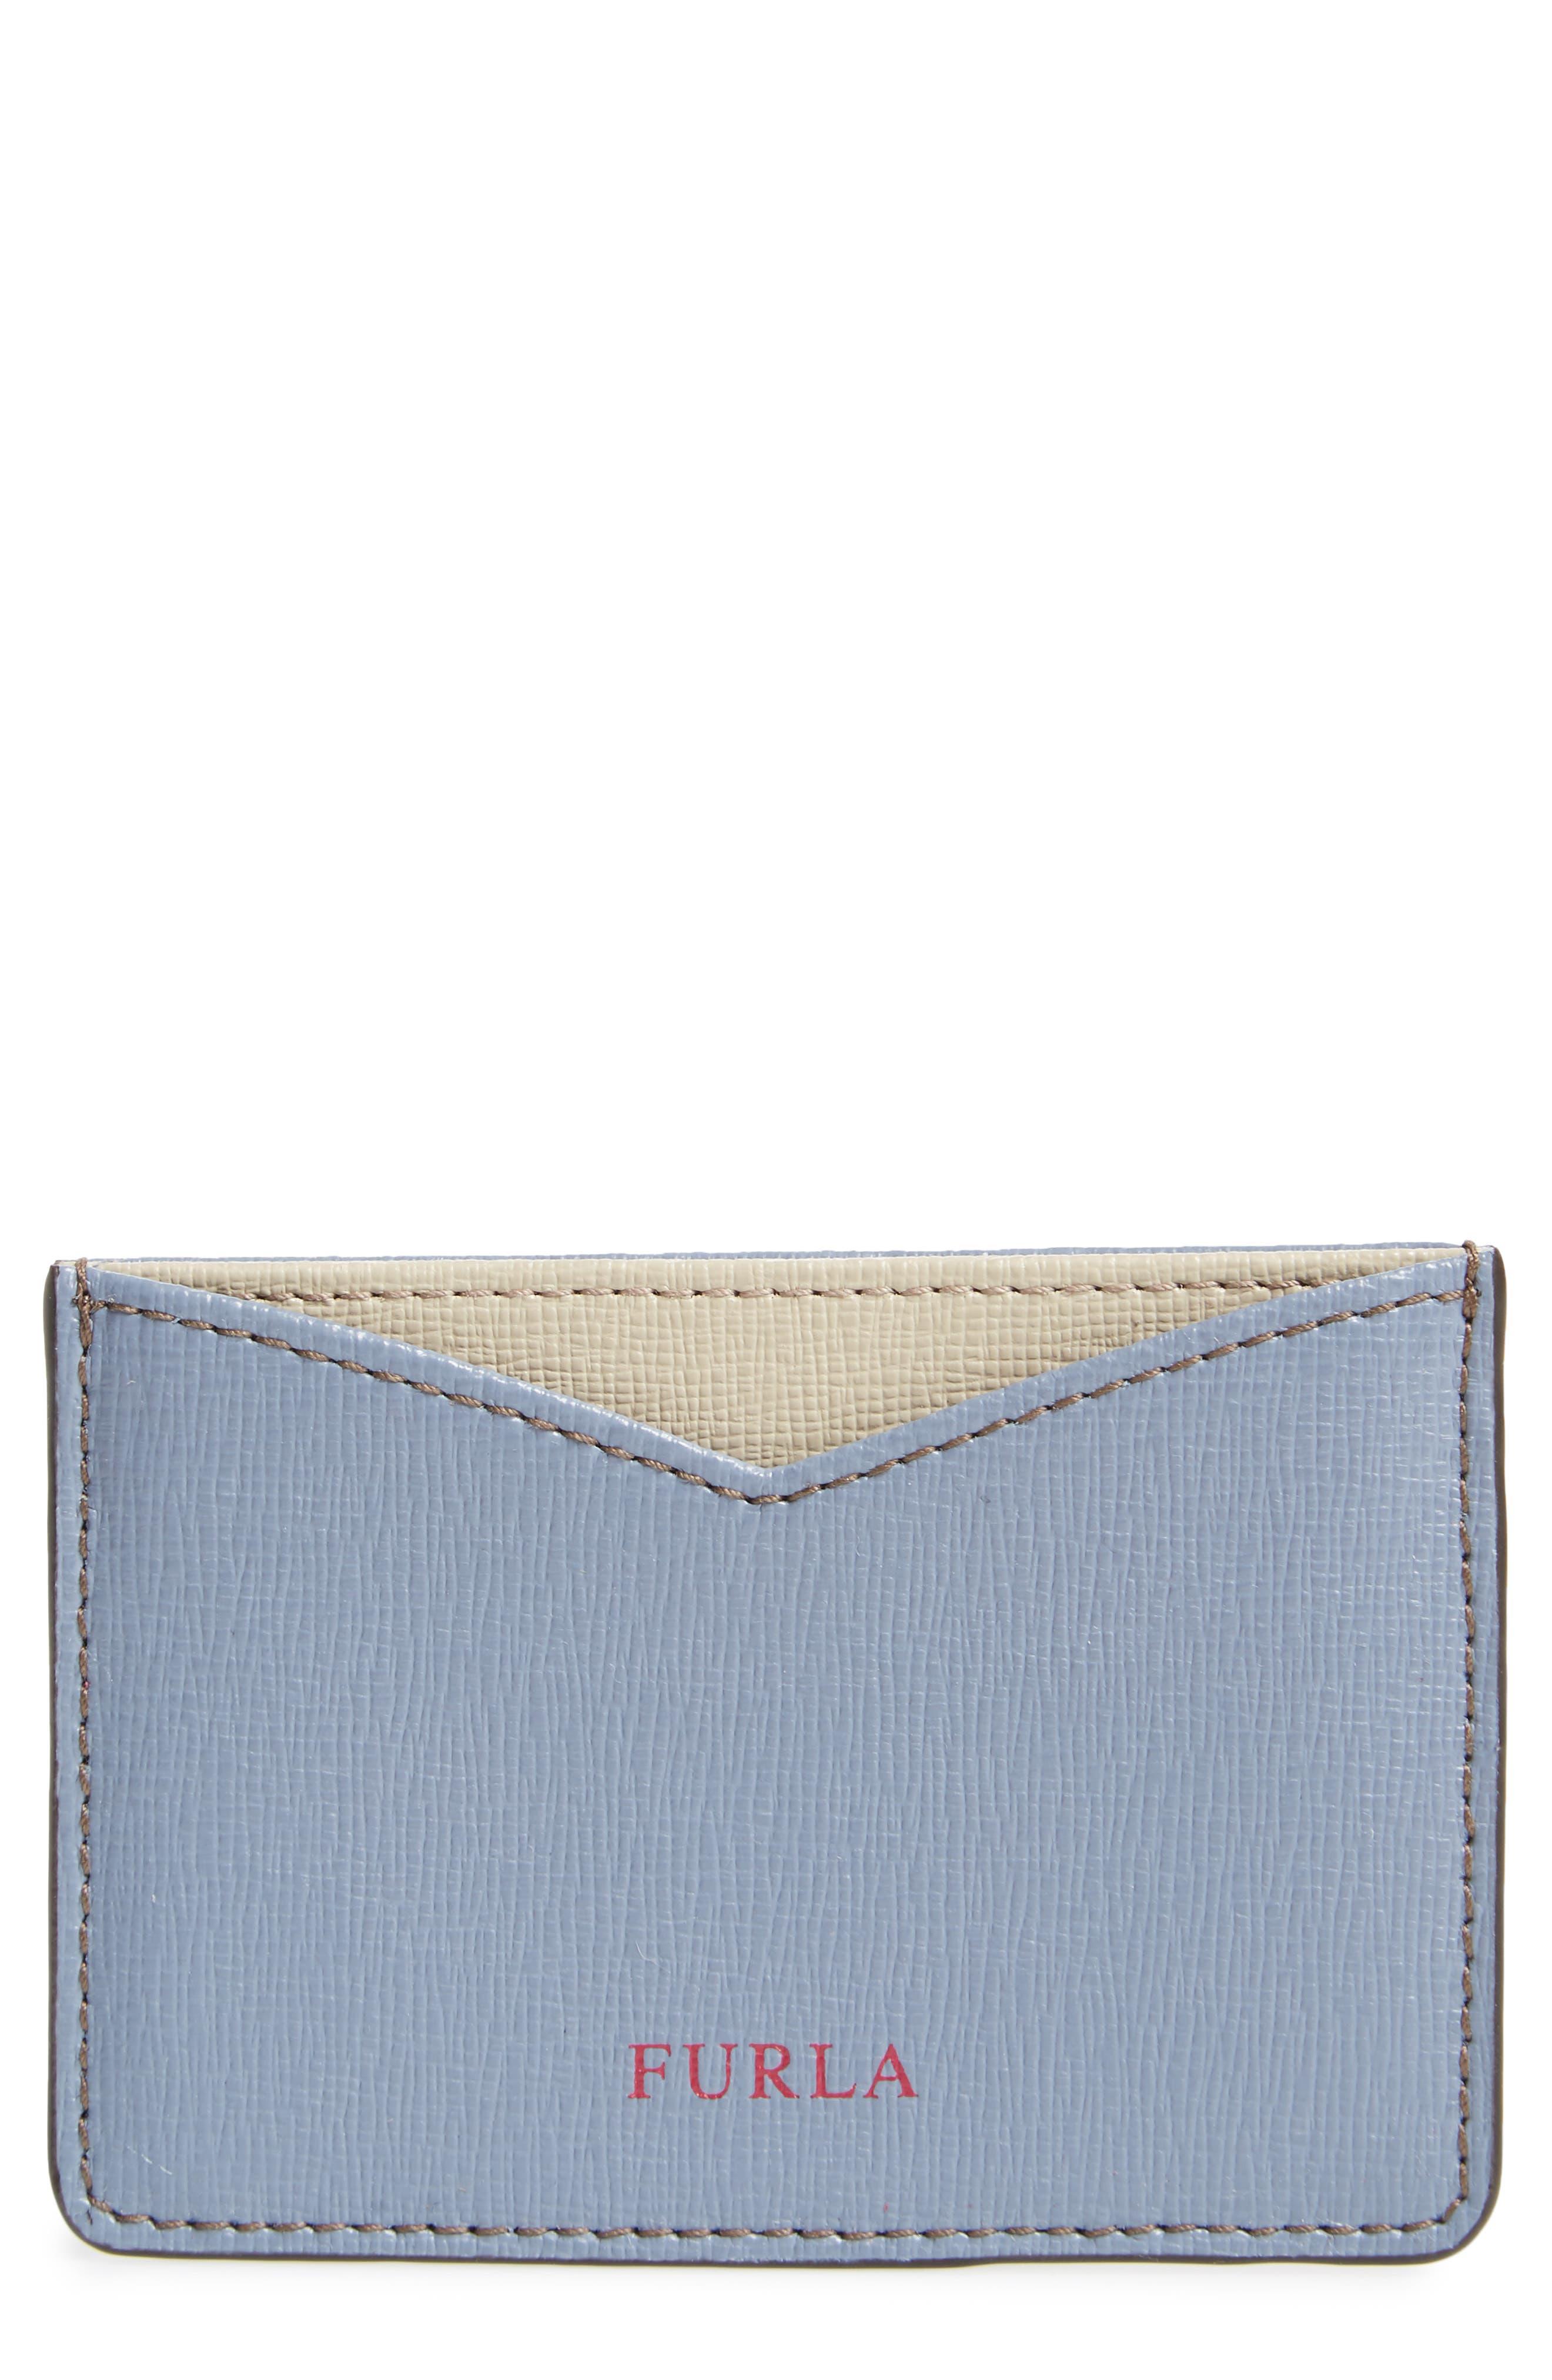 Gioia Saffiano Leather Card Case,                             Main thumbnail 1, color,                             Tempesta+Creta